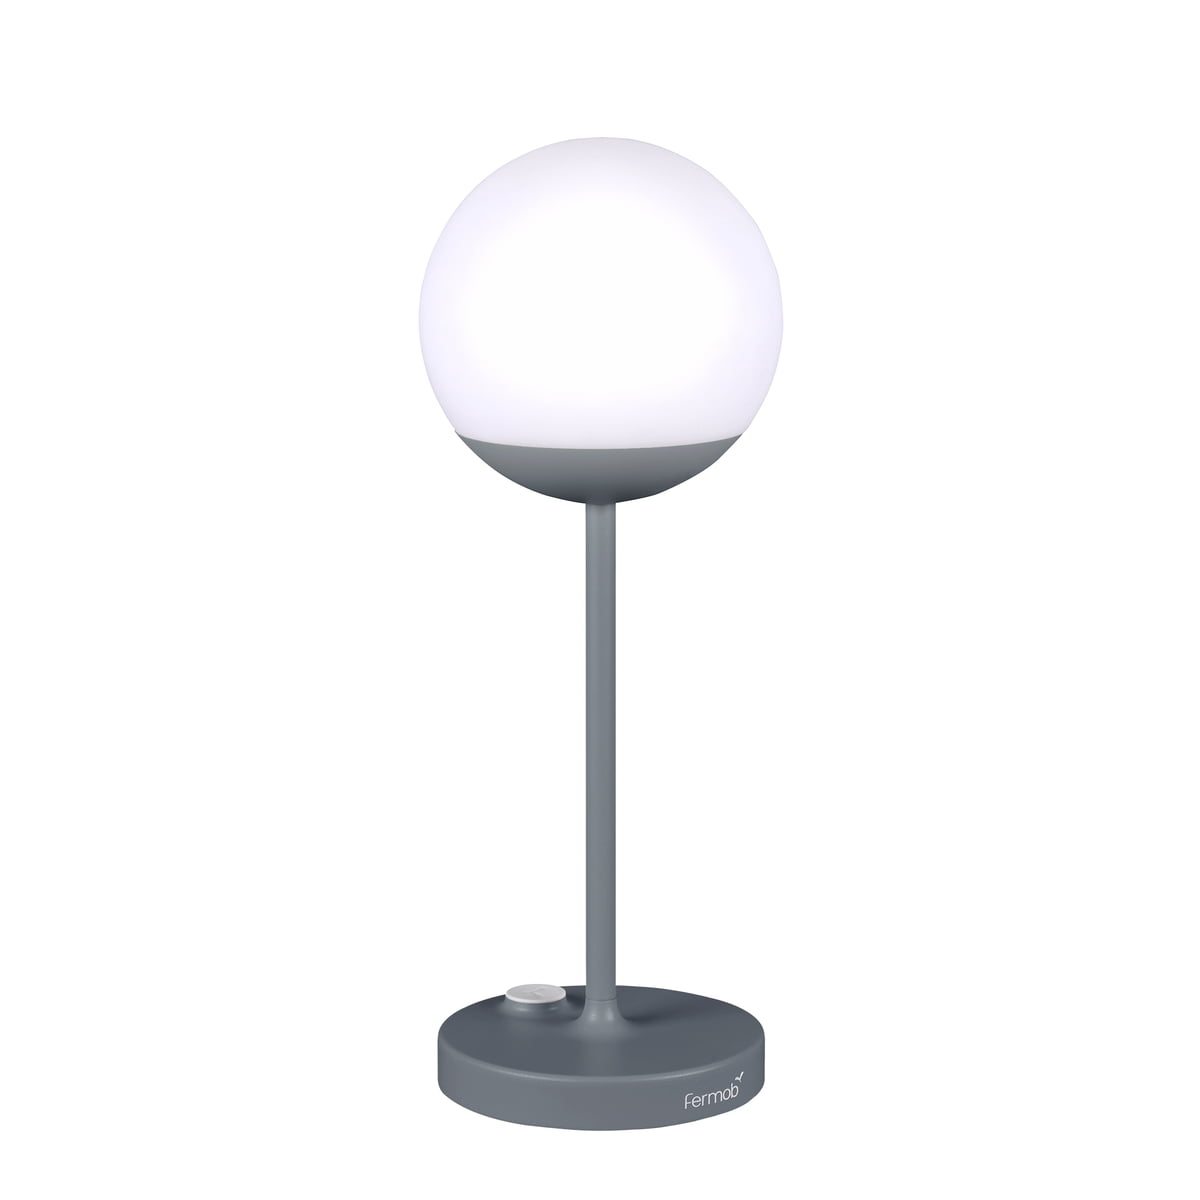 luminaire led batterie mooon fermob connox. Black Bedroom Furniture Sets. Home Design Ideas